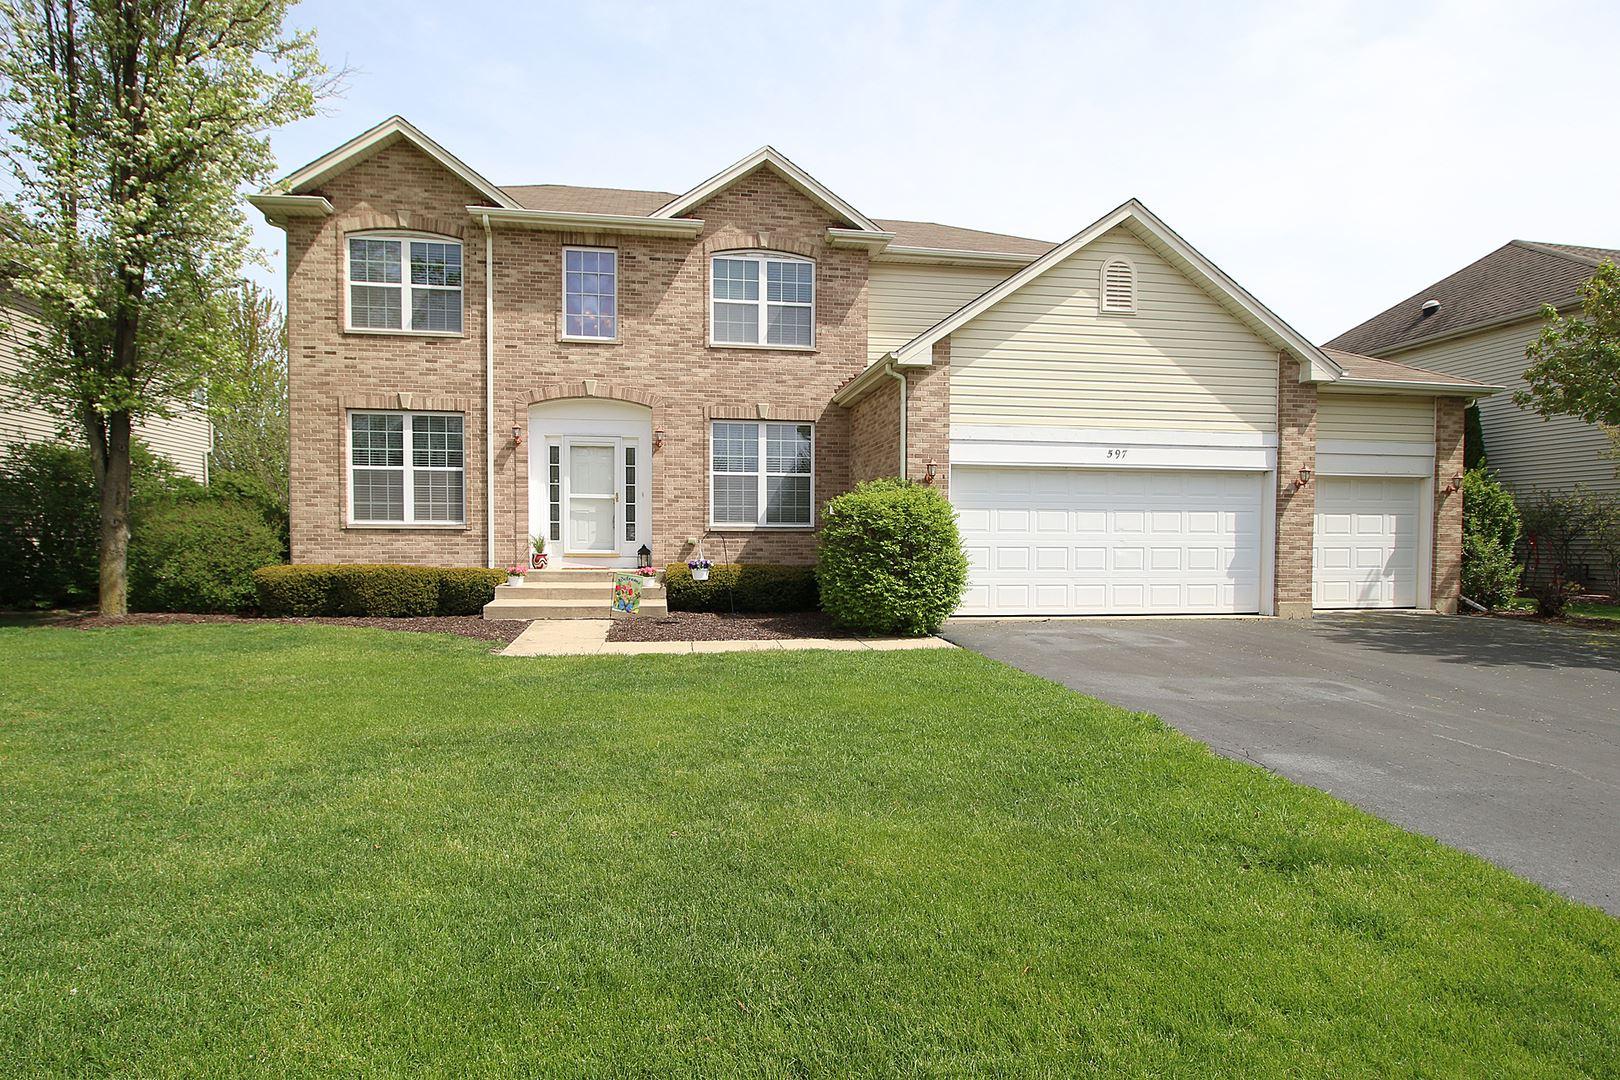 597 Arrowhead Drive, Yorkville, IL 60560 - #: 10706783